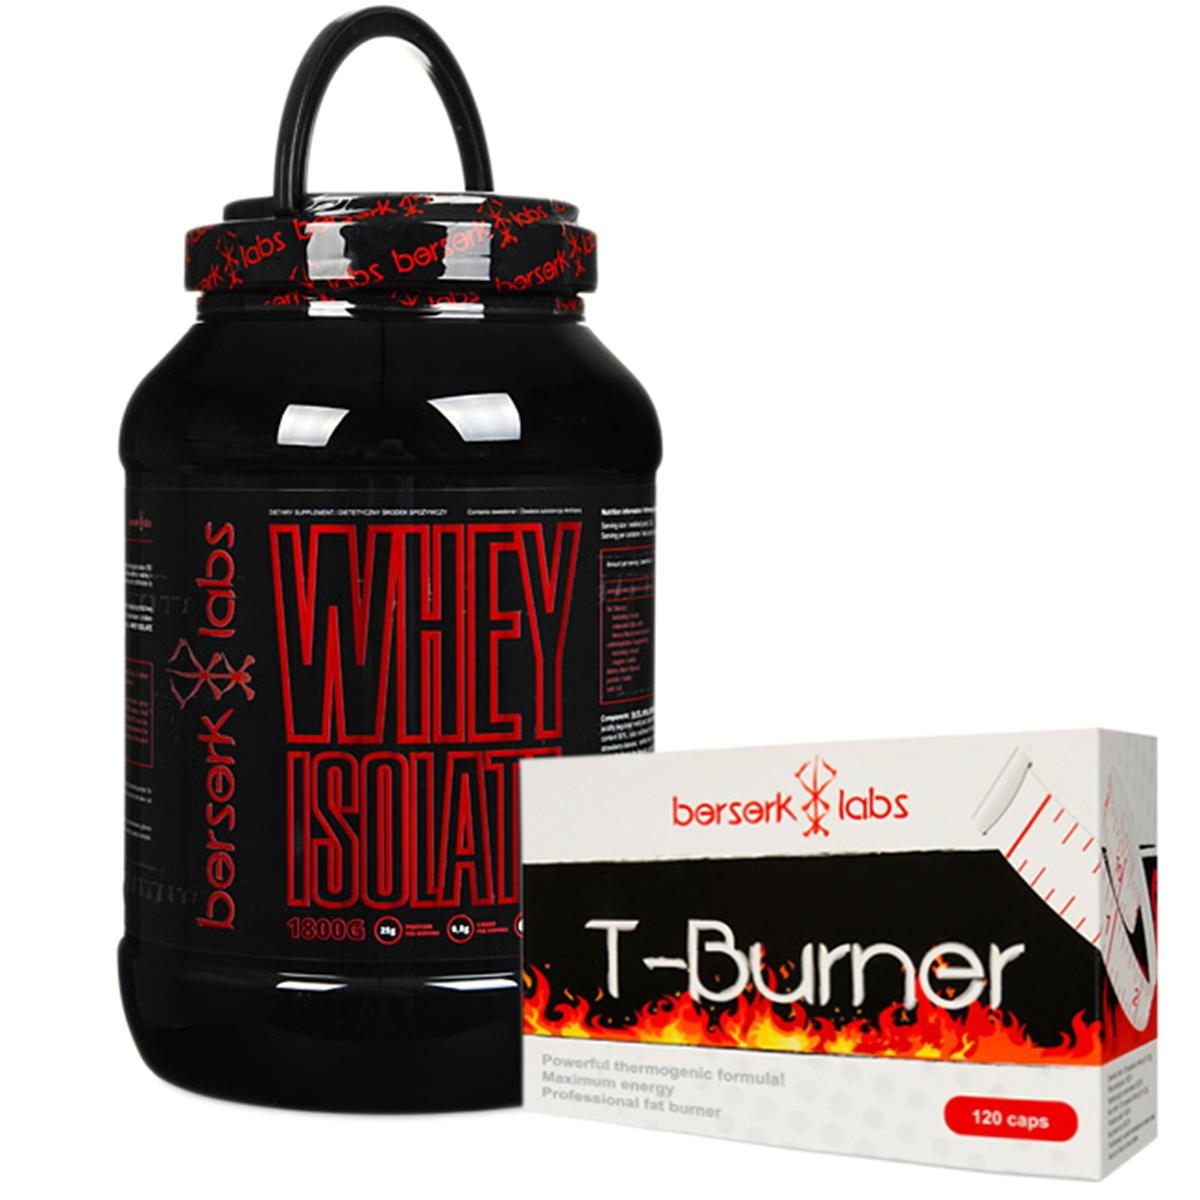 10dadf7cba92 169 PLN • Whey Isolate + T-Burner 1800g+120kaps - Berserk Labs ...